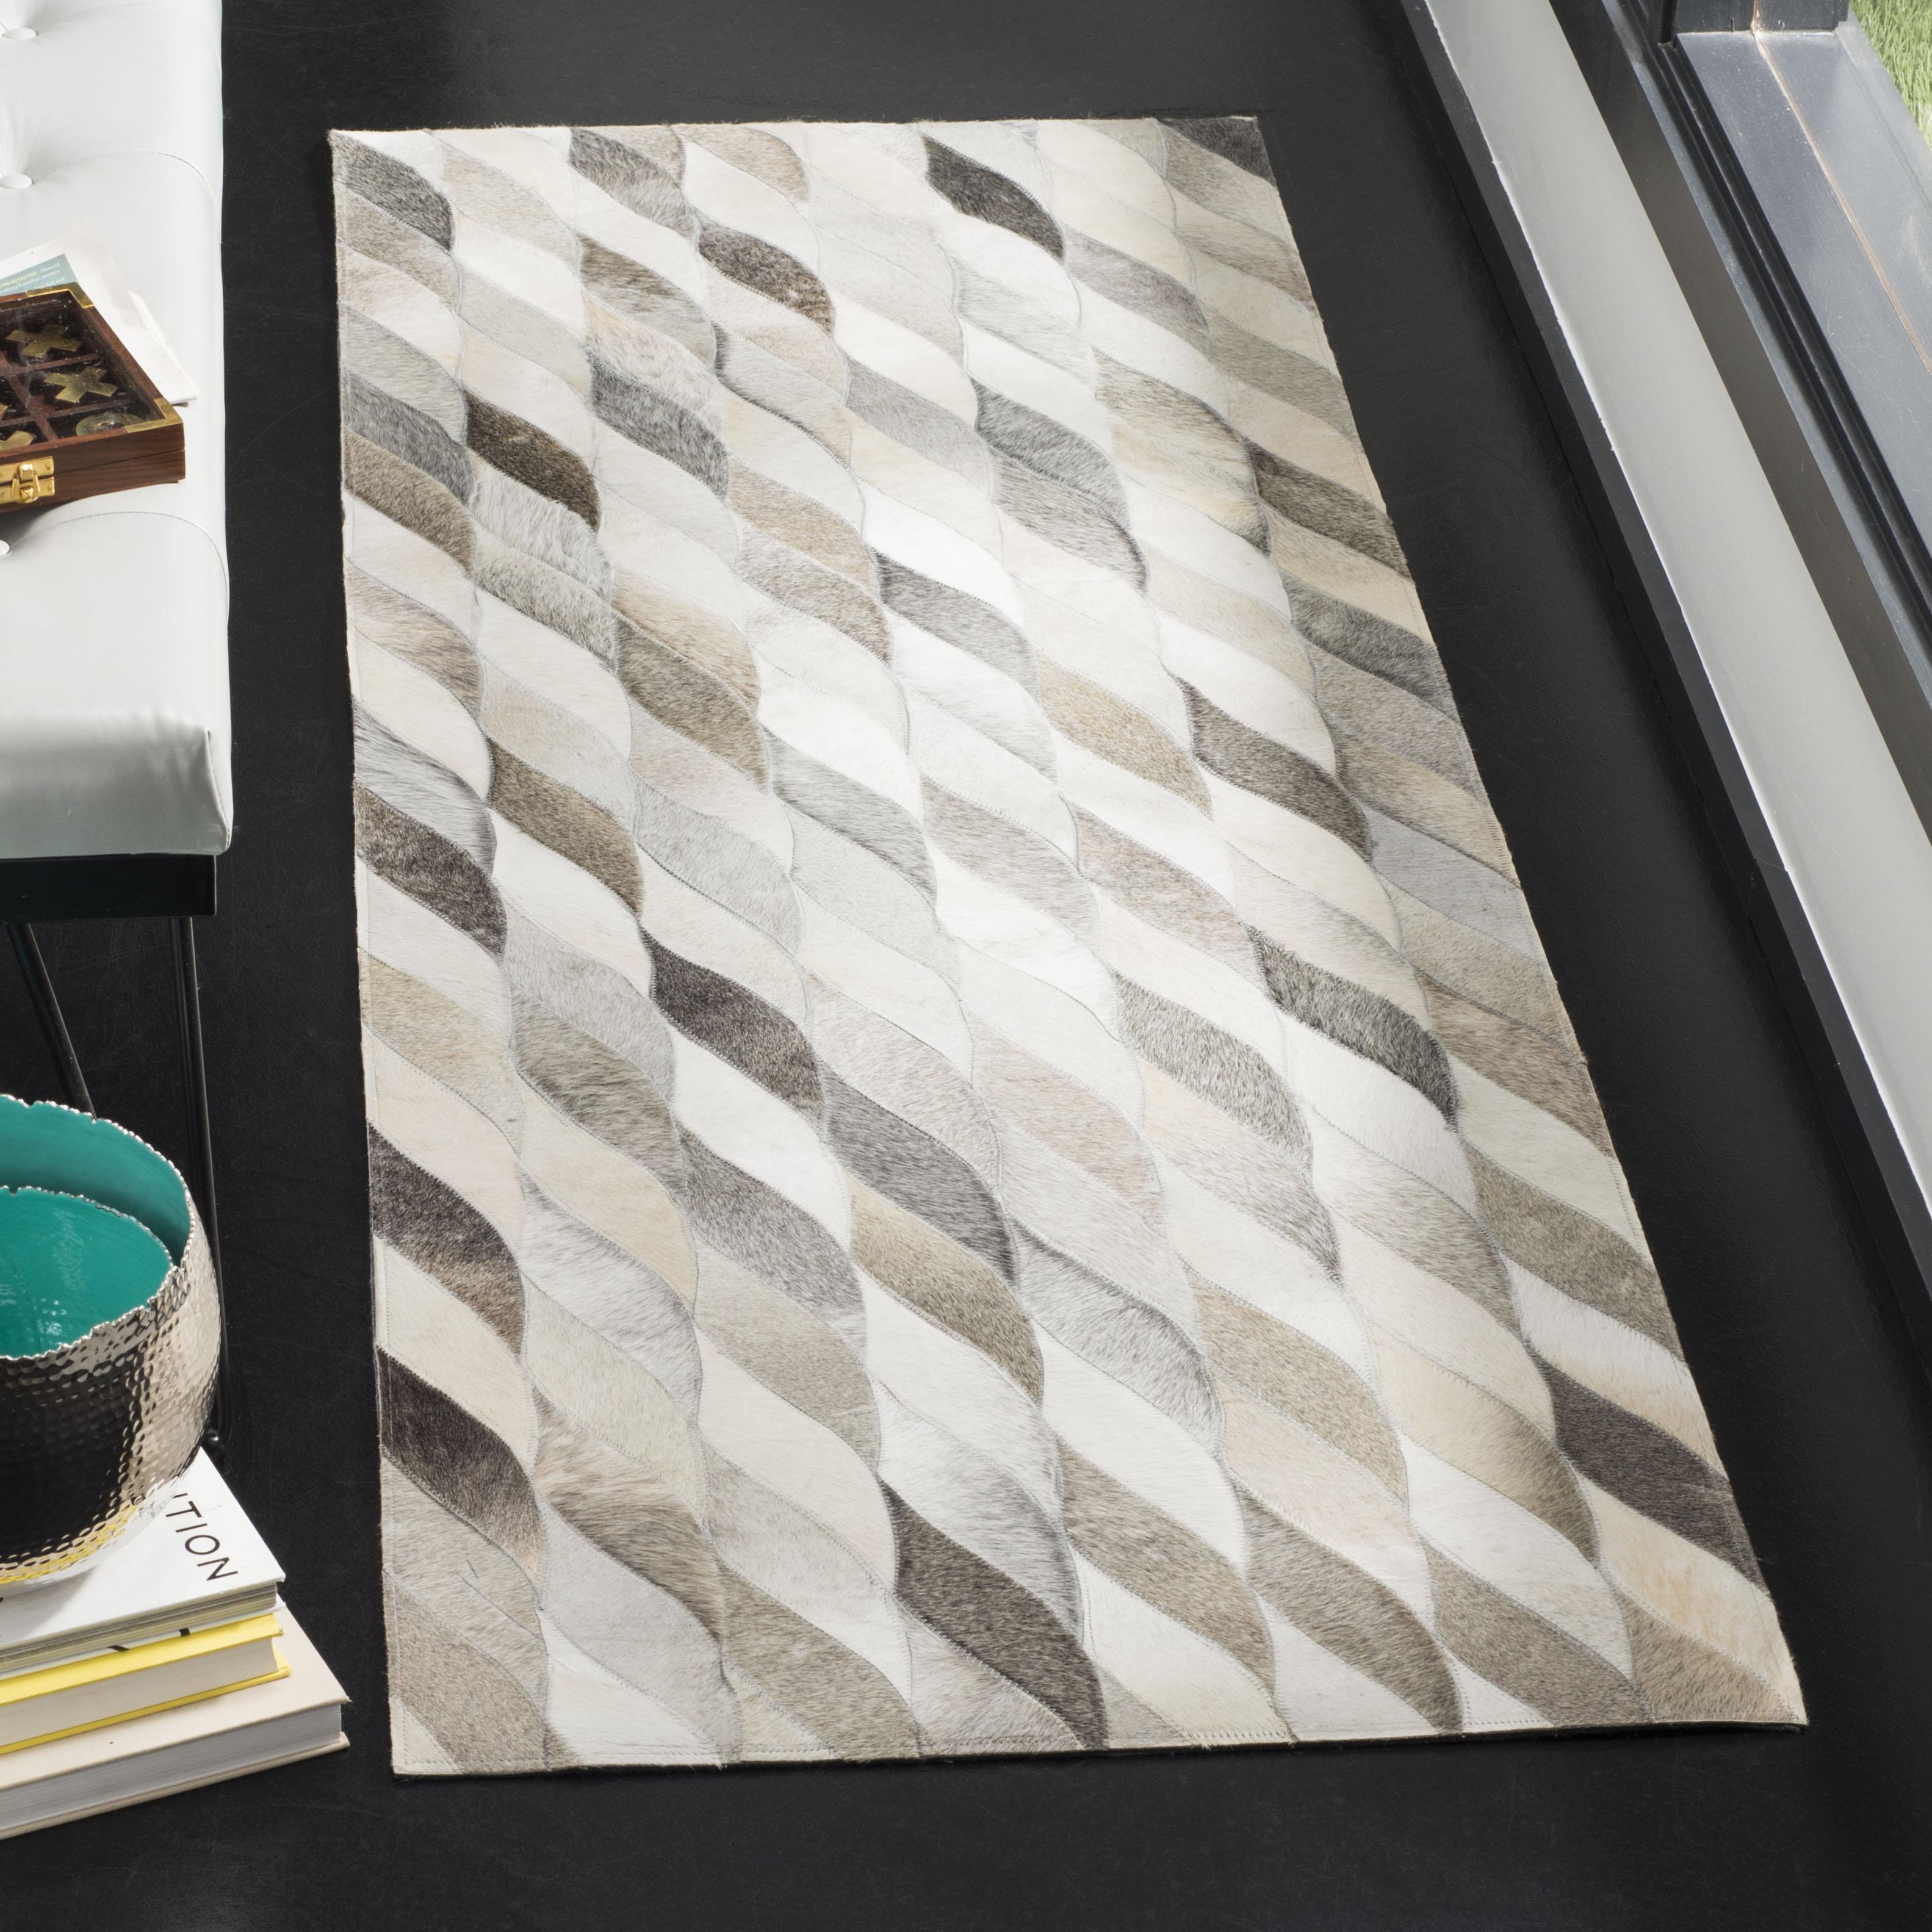 Safavieh Studio Leather Marissa Geometric Area Rug or Runner